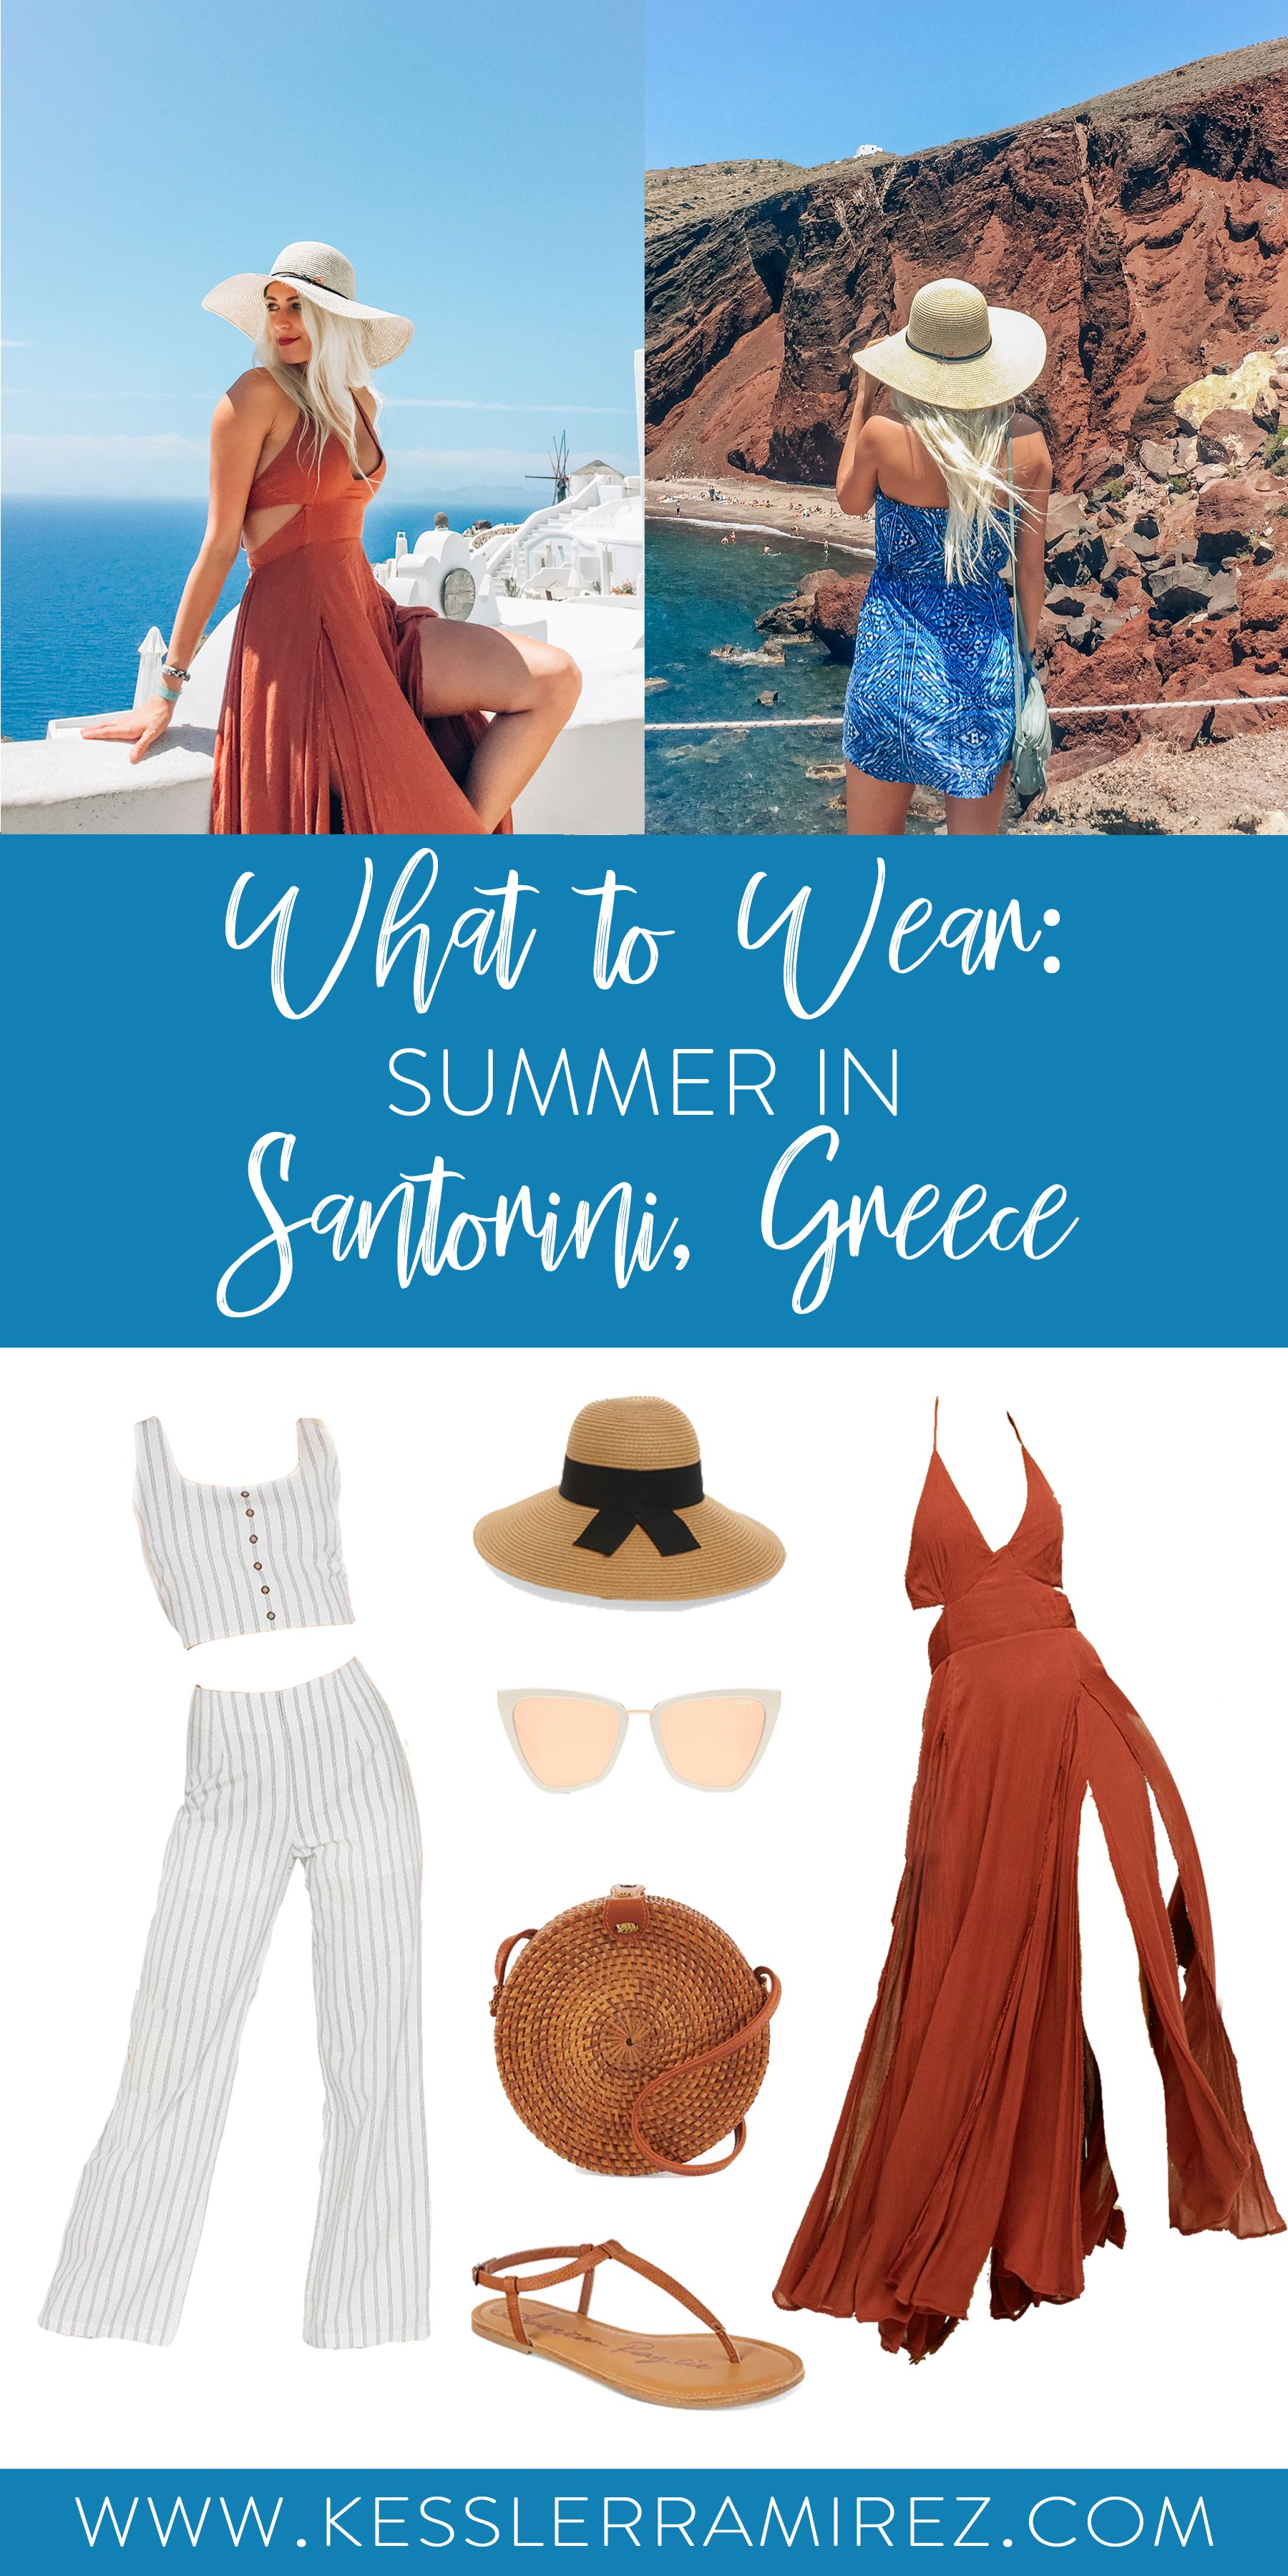 What to Wear: Summer in Santorini, Greece